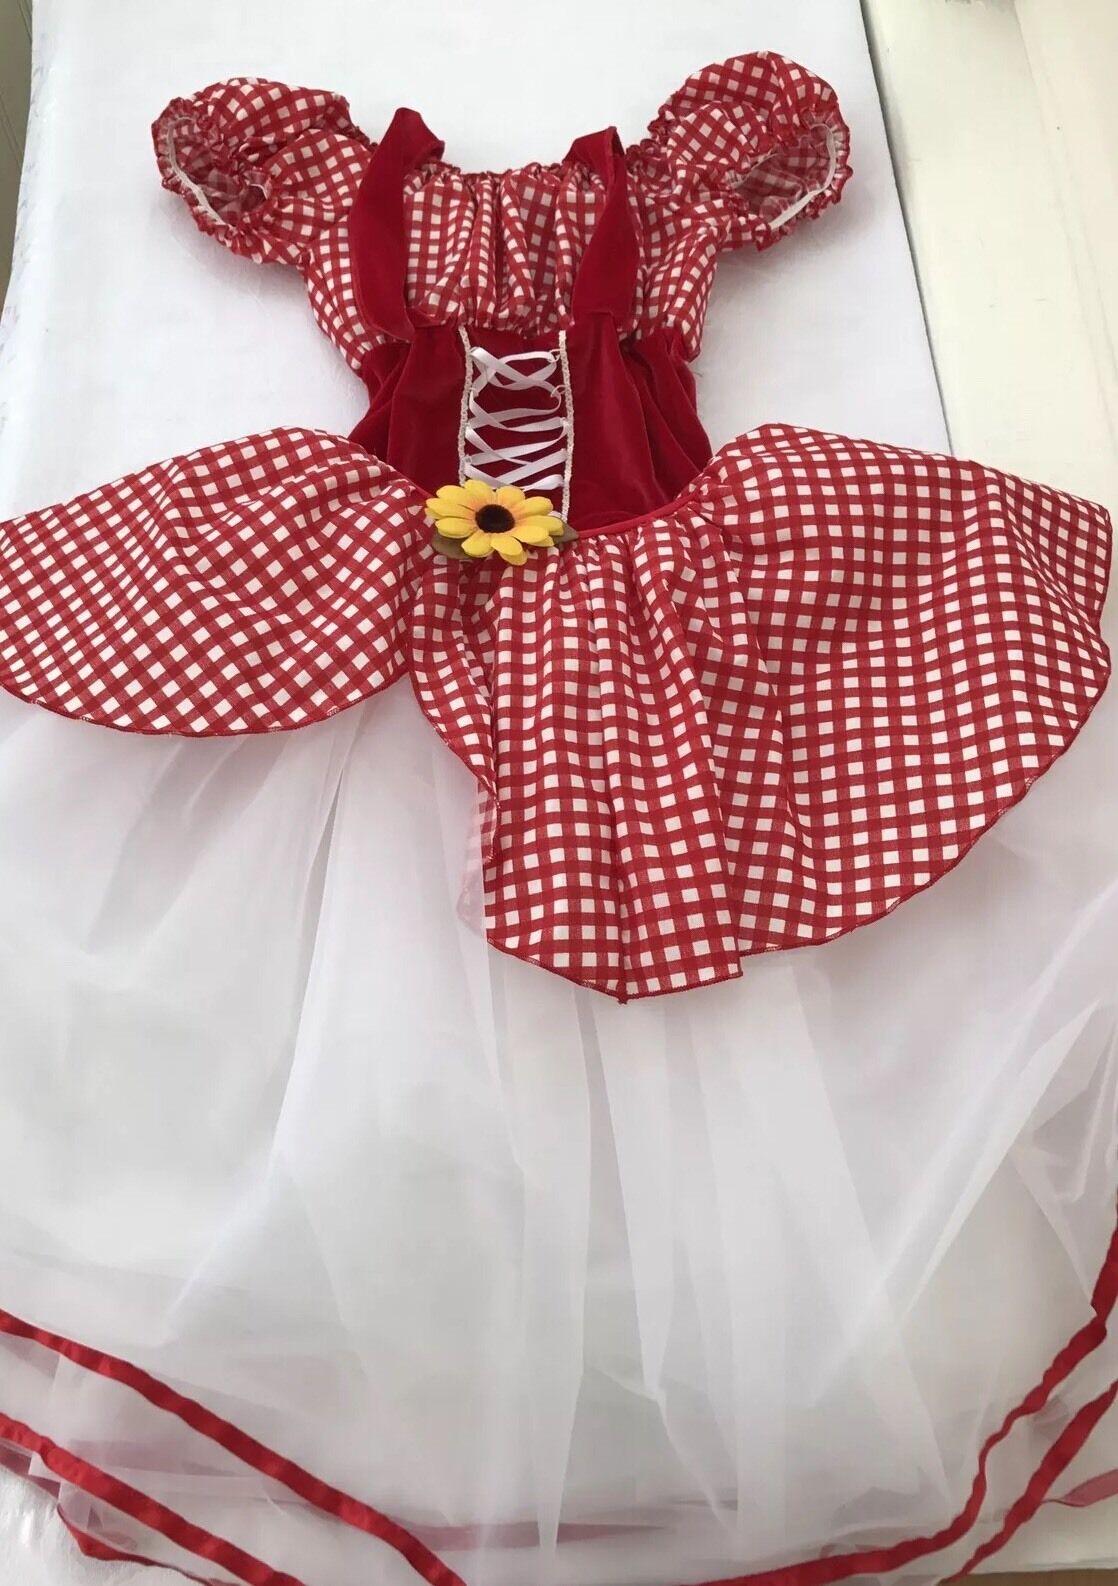 Girls Dance wear Costume Peasant Rodeo E324 Large Velvet Art Stone Country Tutu